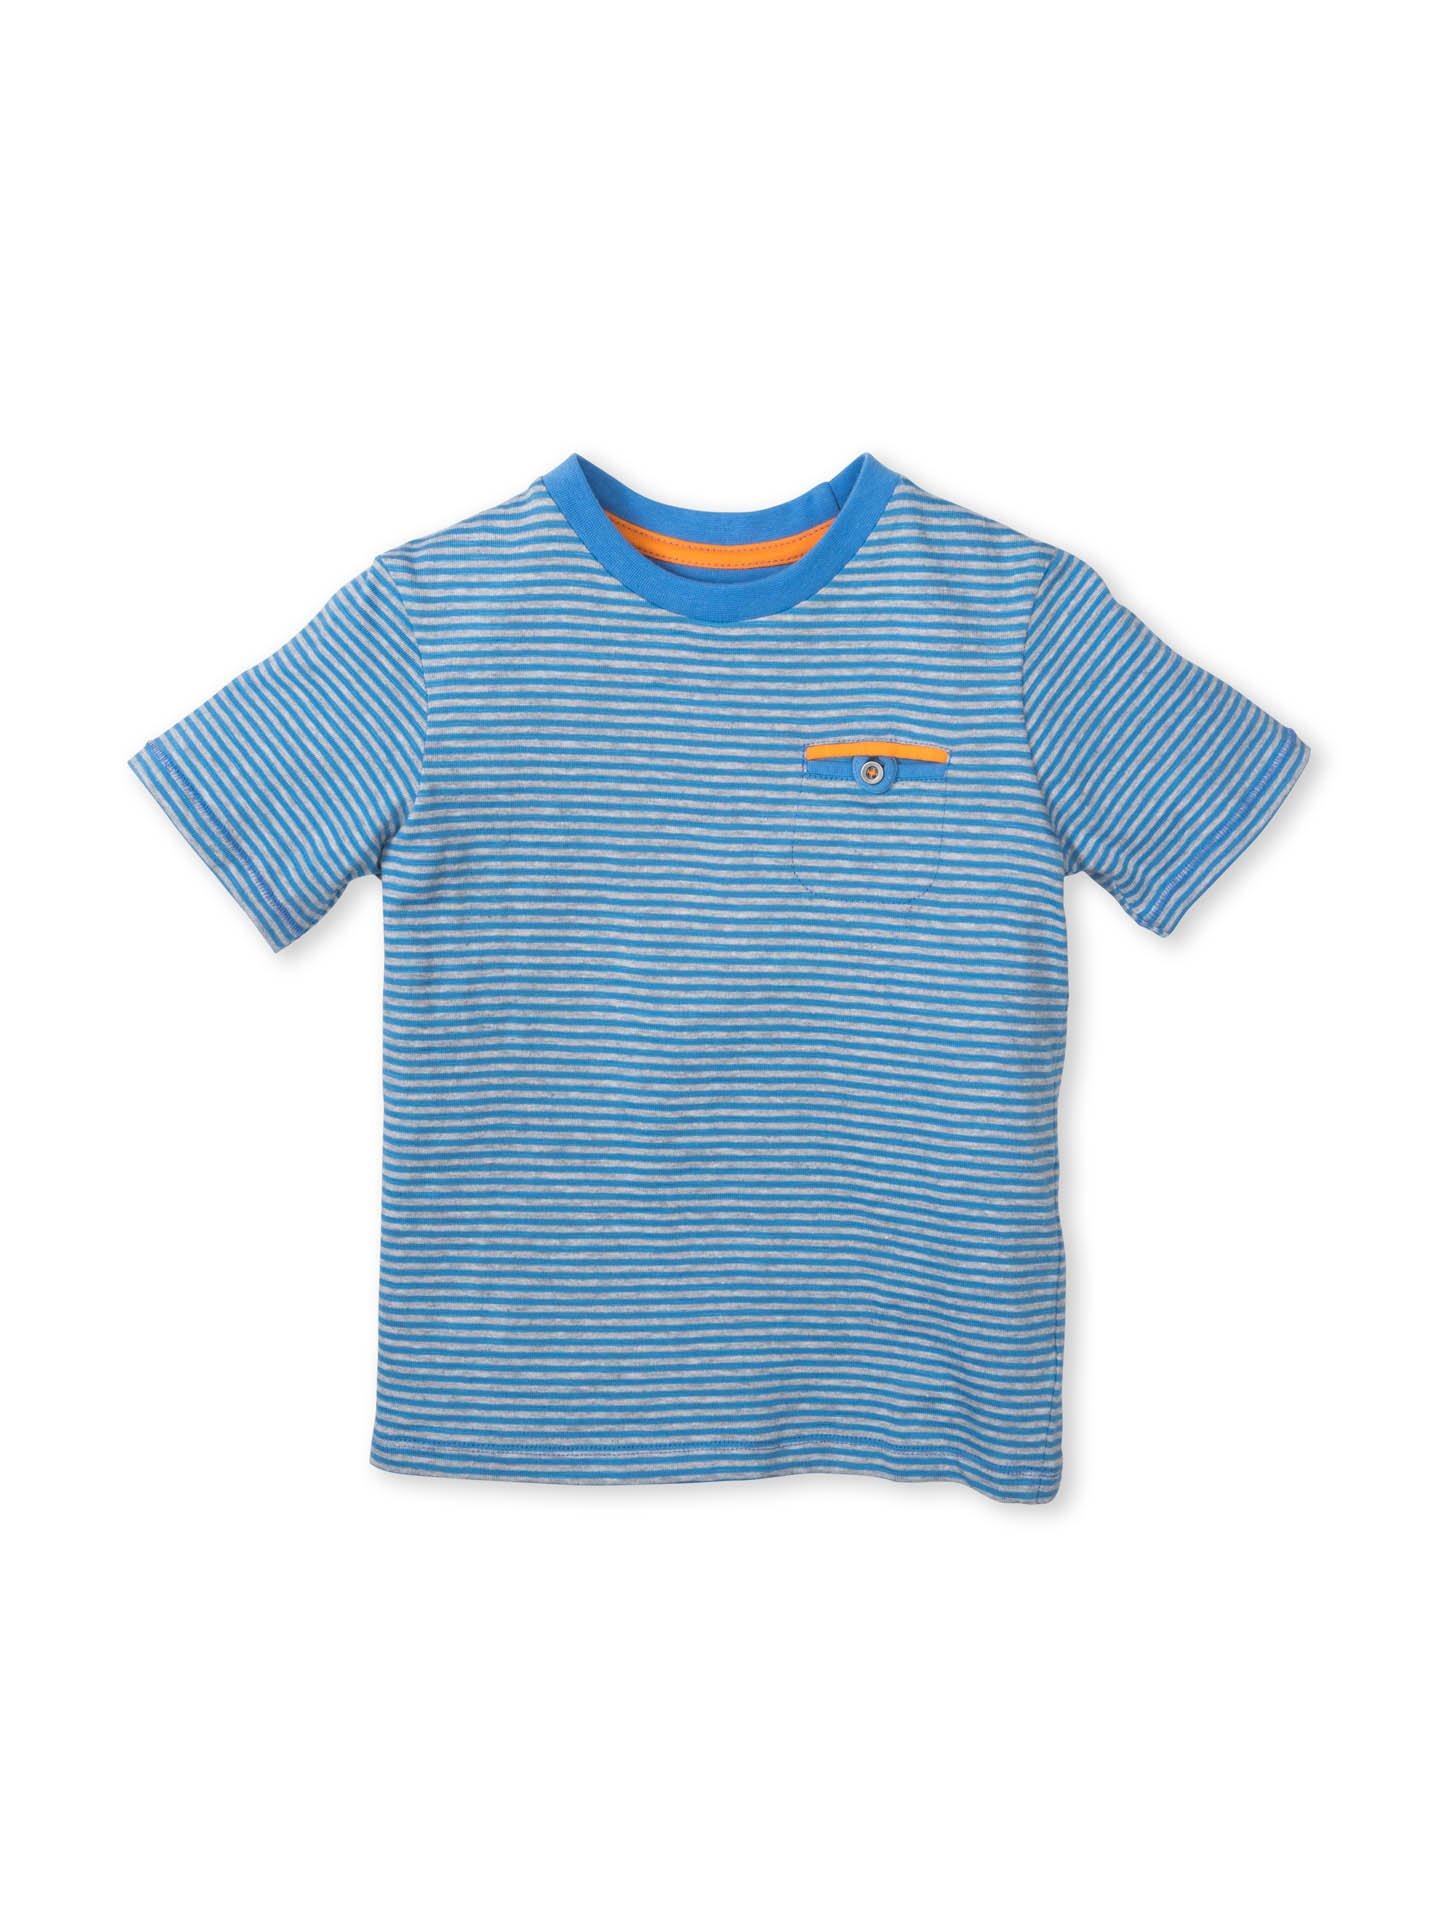 Colored Organics Boys Organic Crew Tee Shirt - Blue Stripe - 5T by Colored Organics (Image #6)